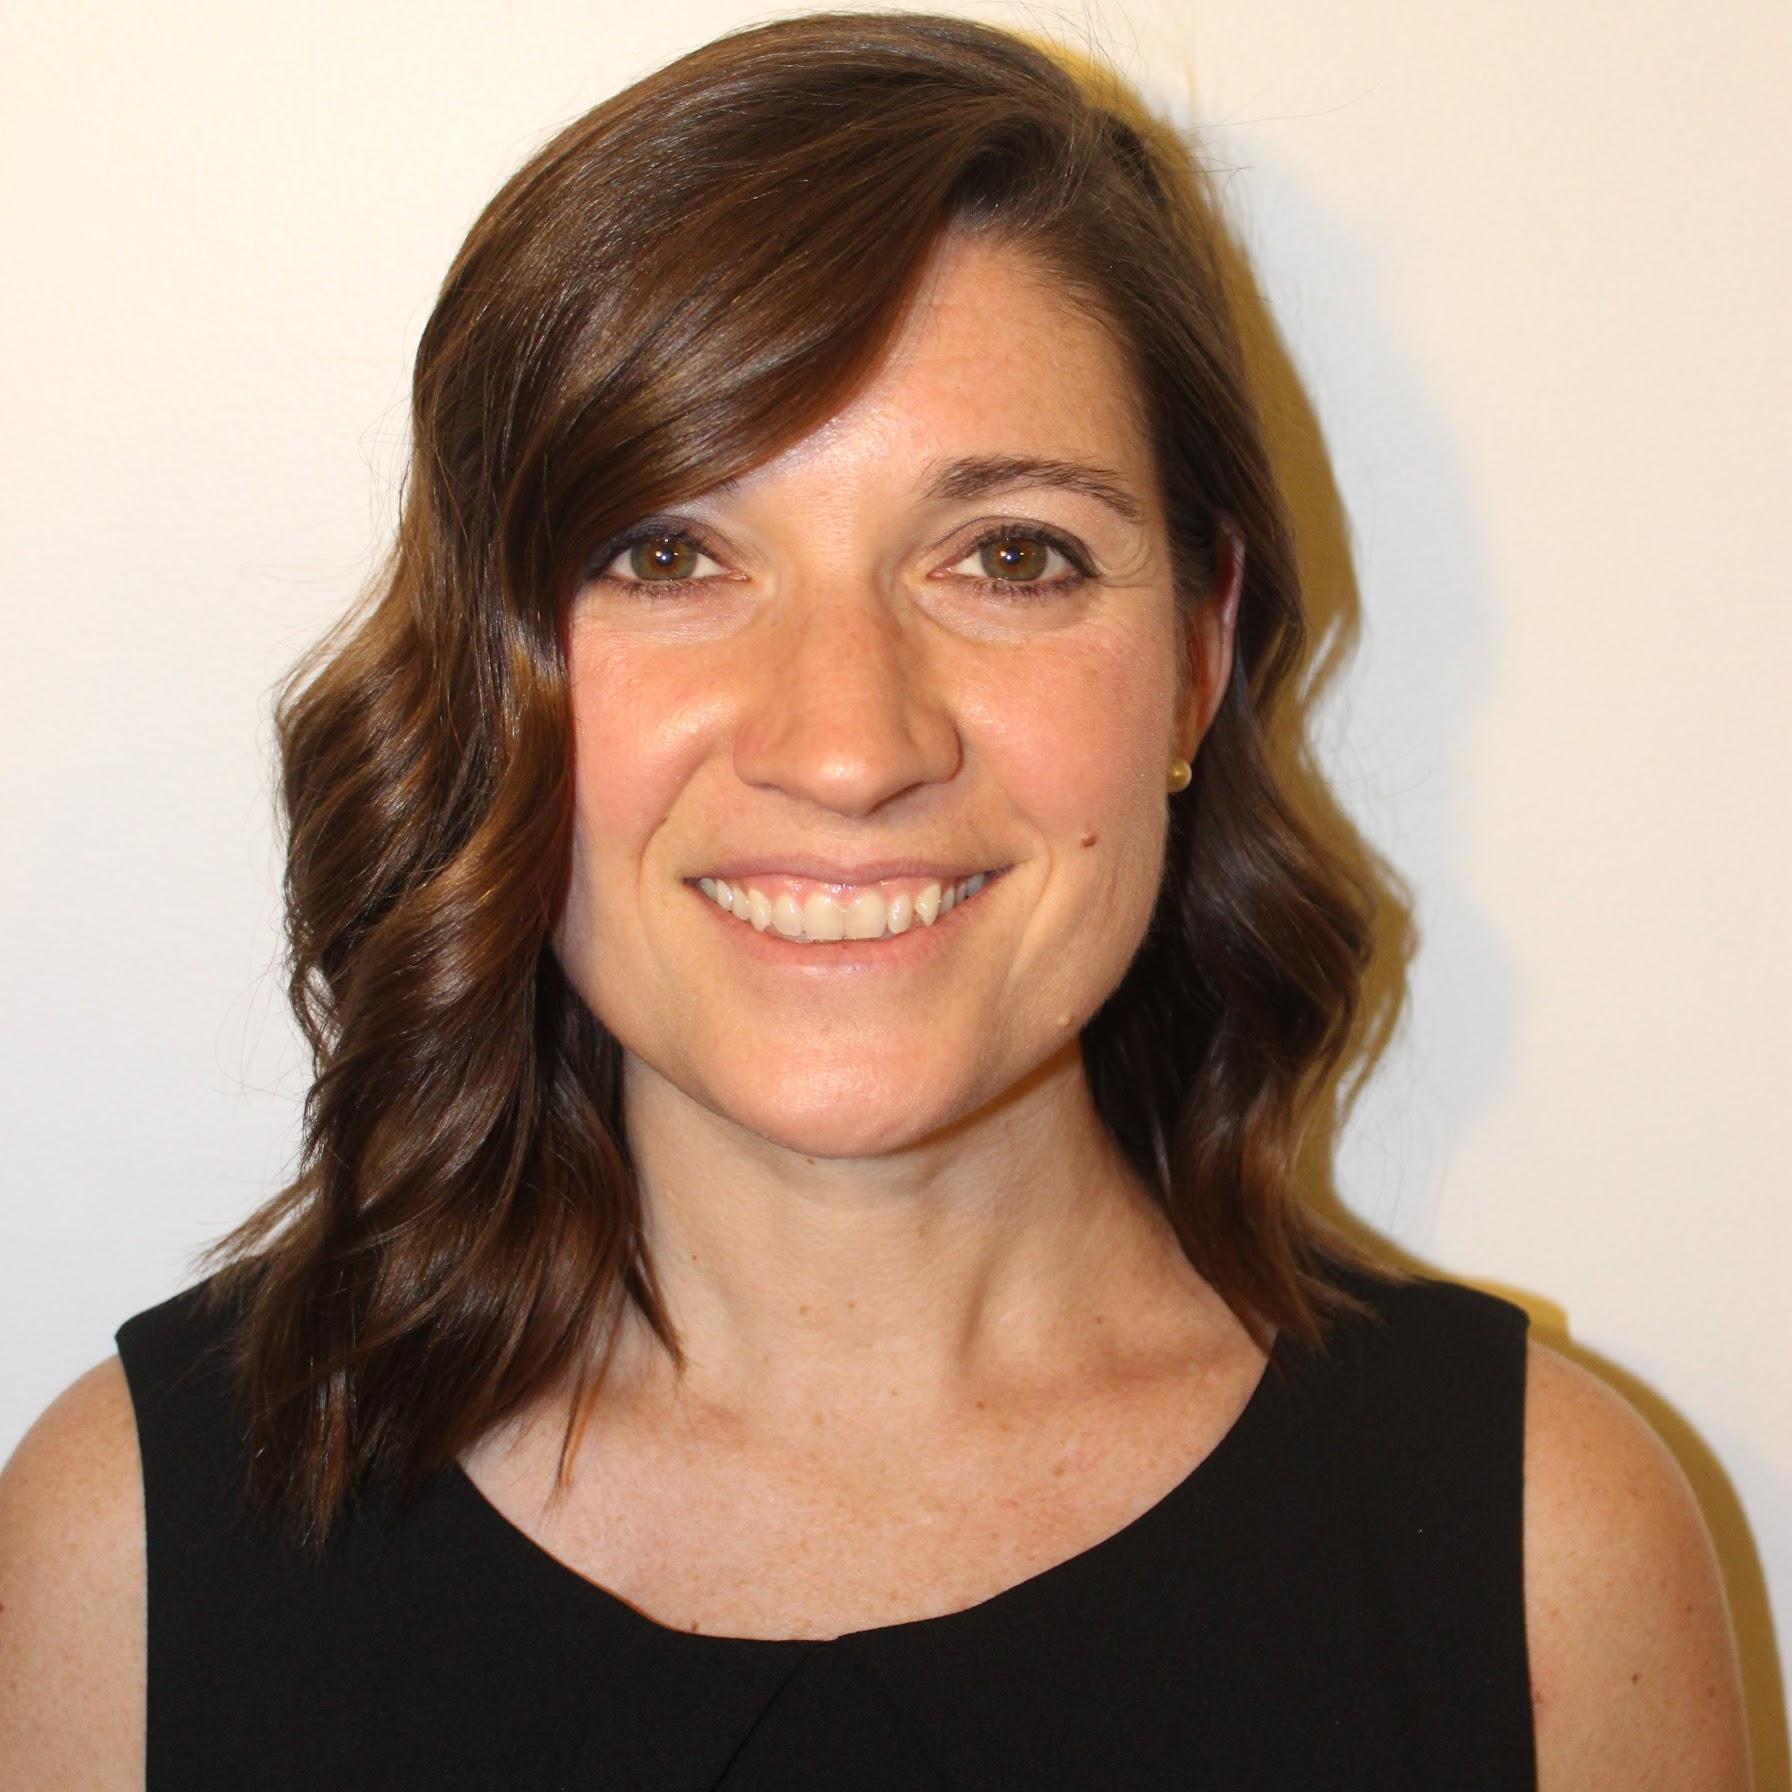 Angela Landers Headshot